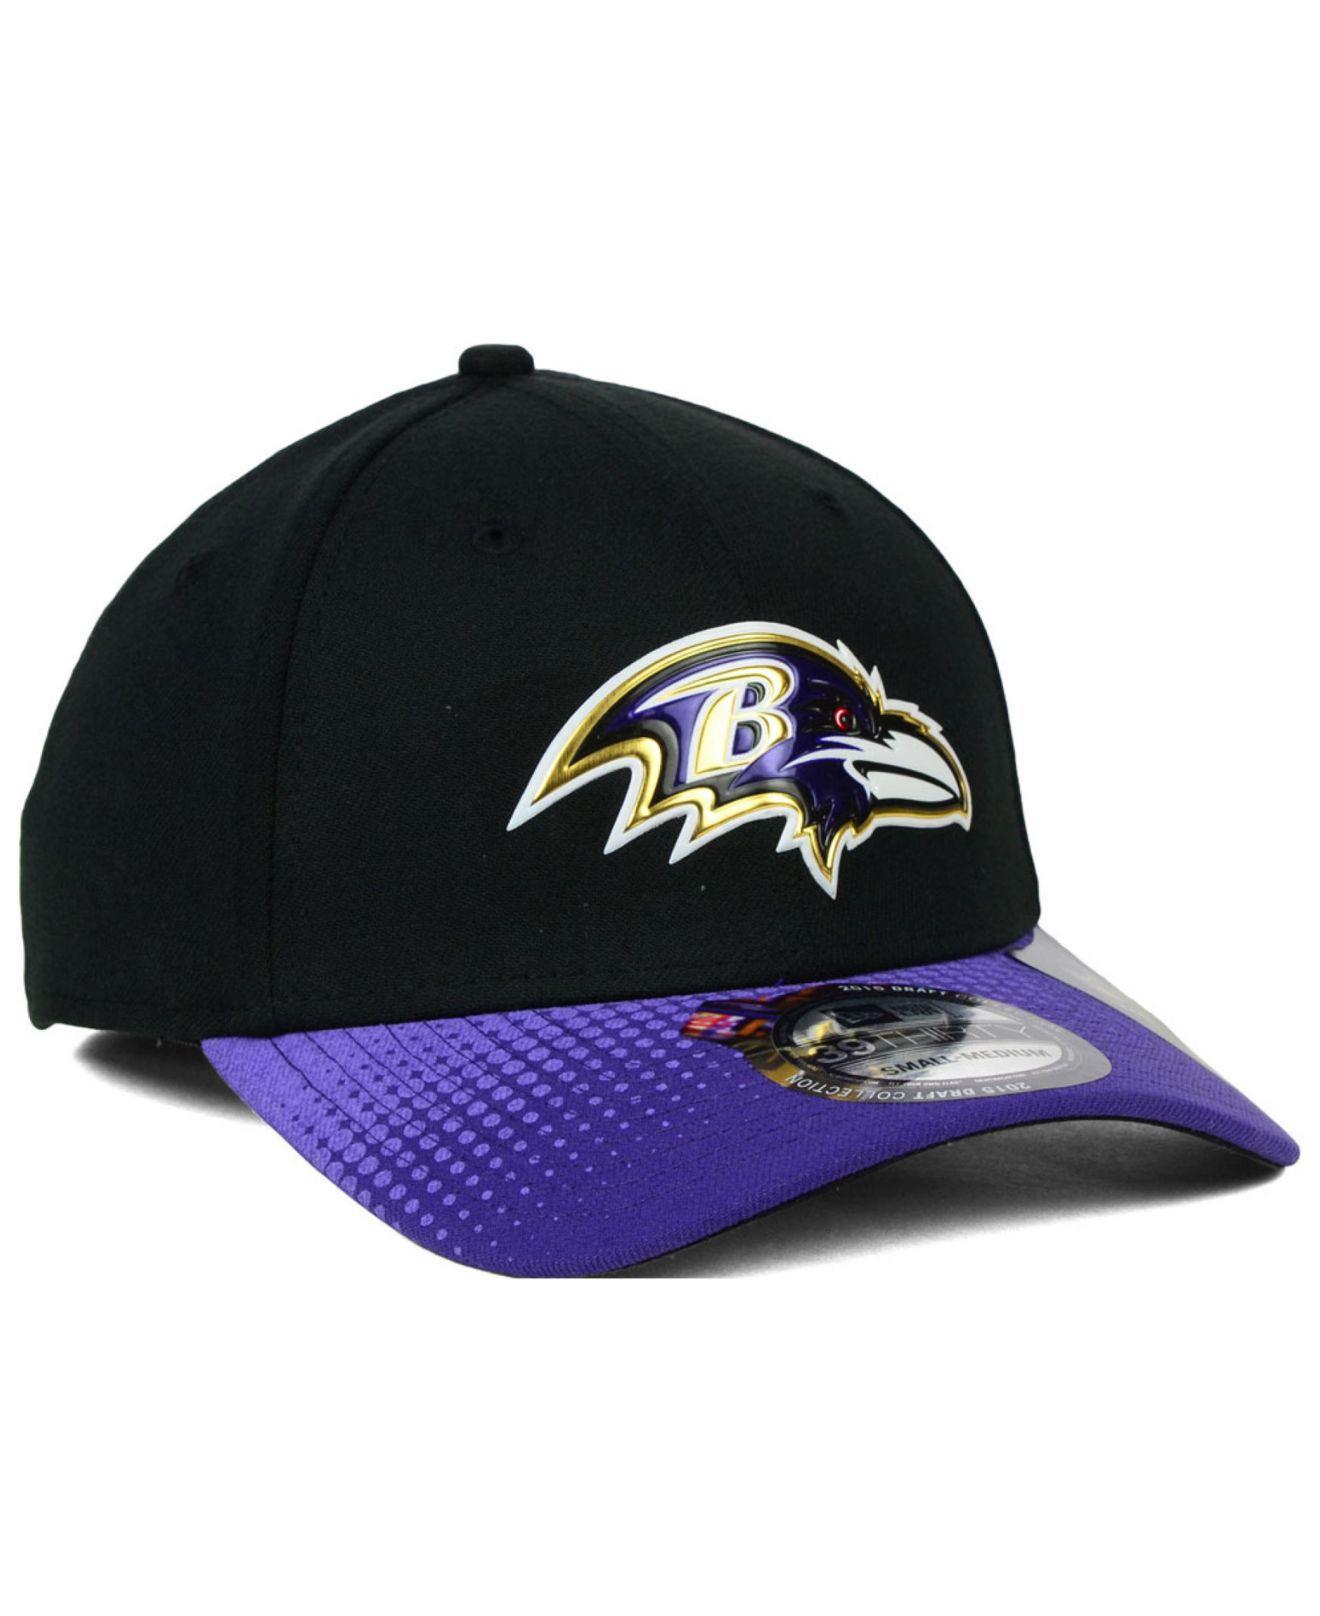 Men's New Era Baltimore Ravens NFL Draft 39THIRTY Reverse Flex Hat